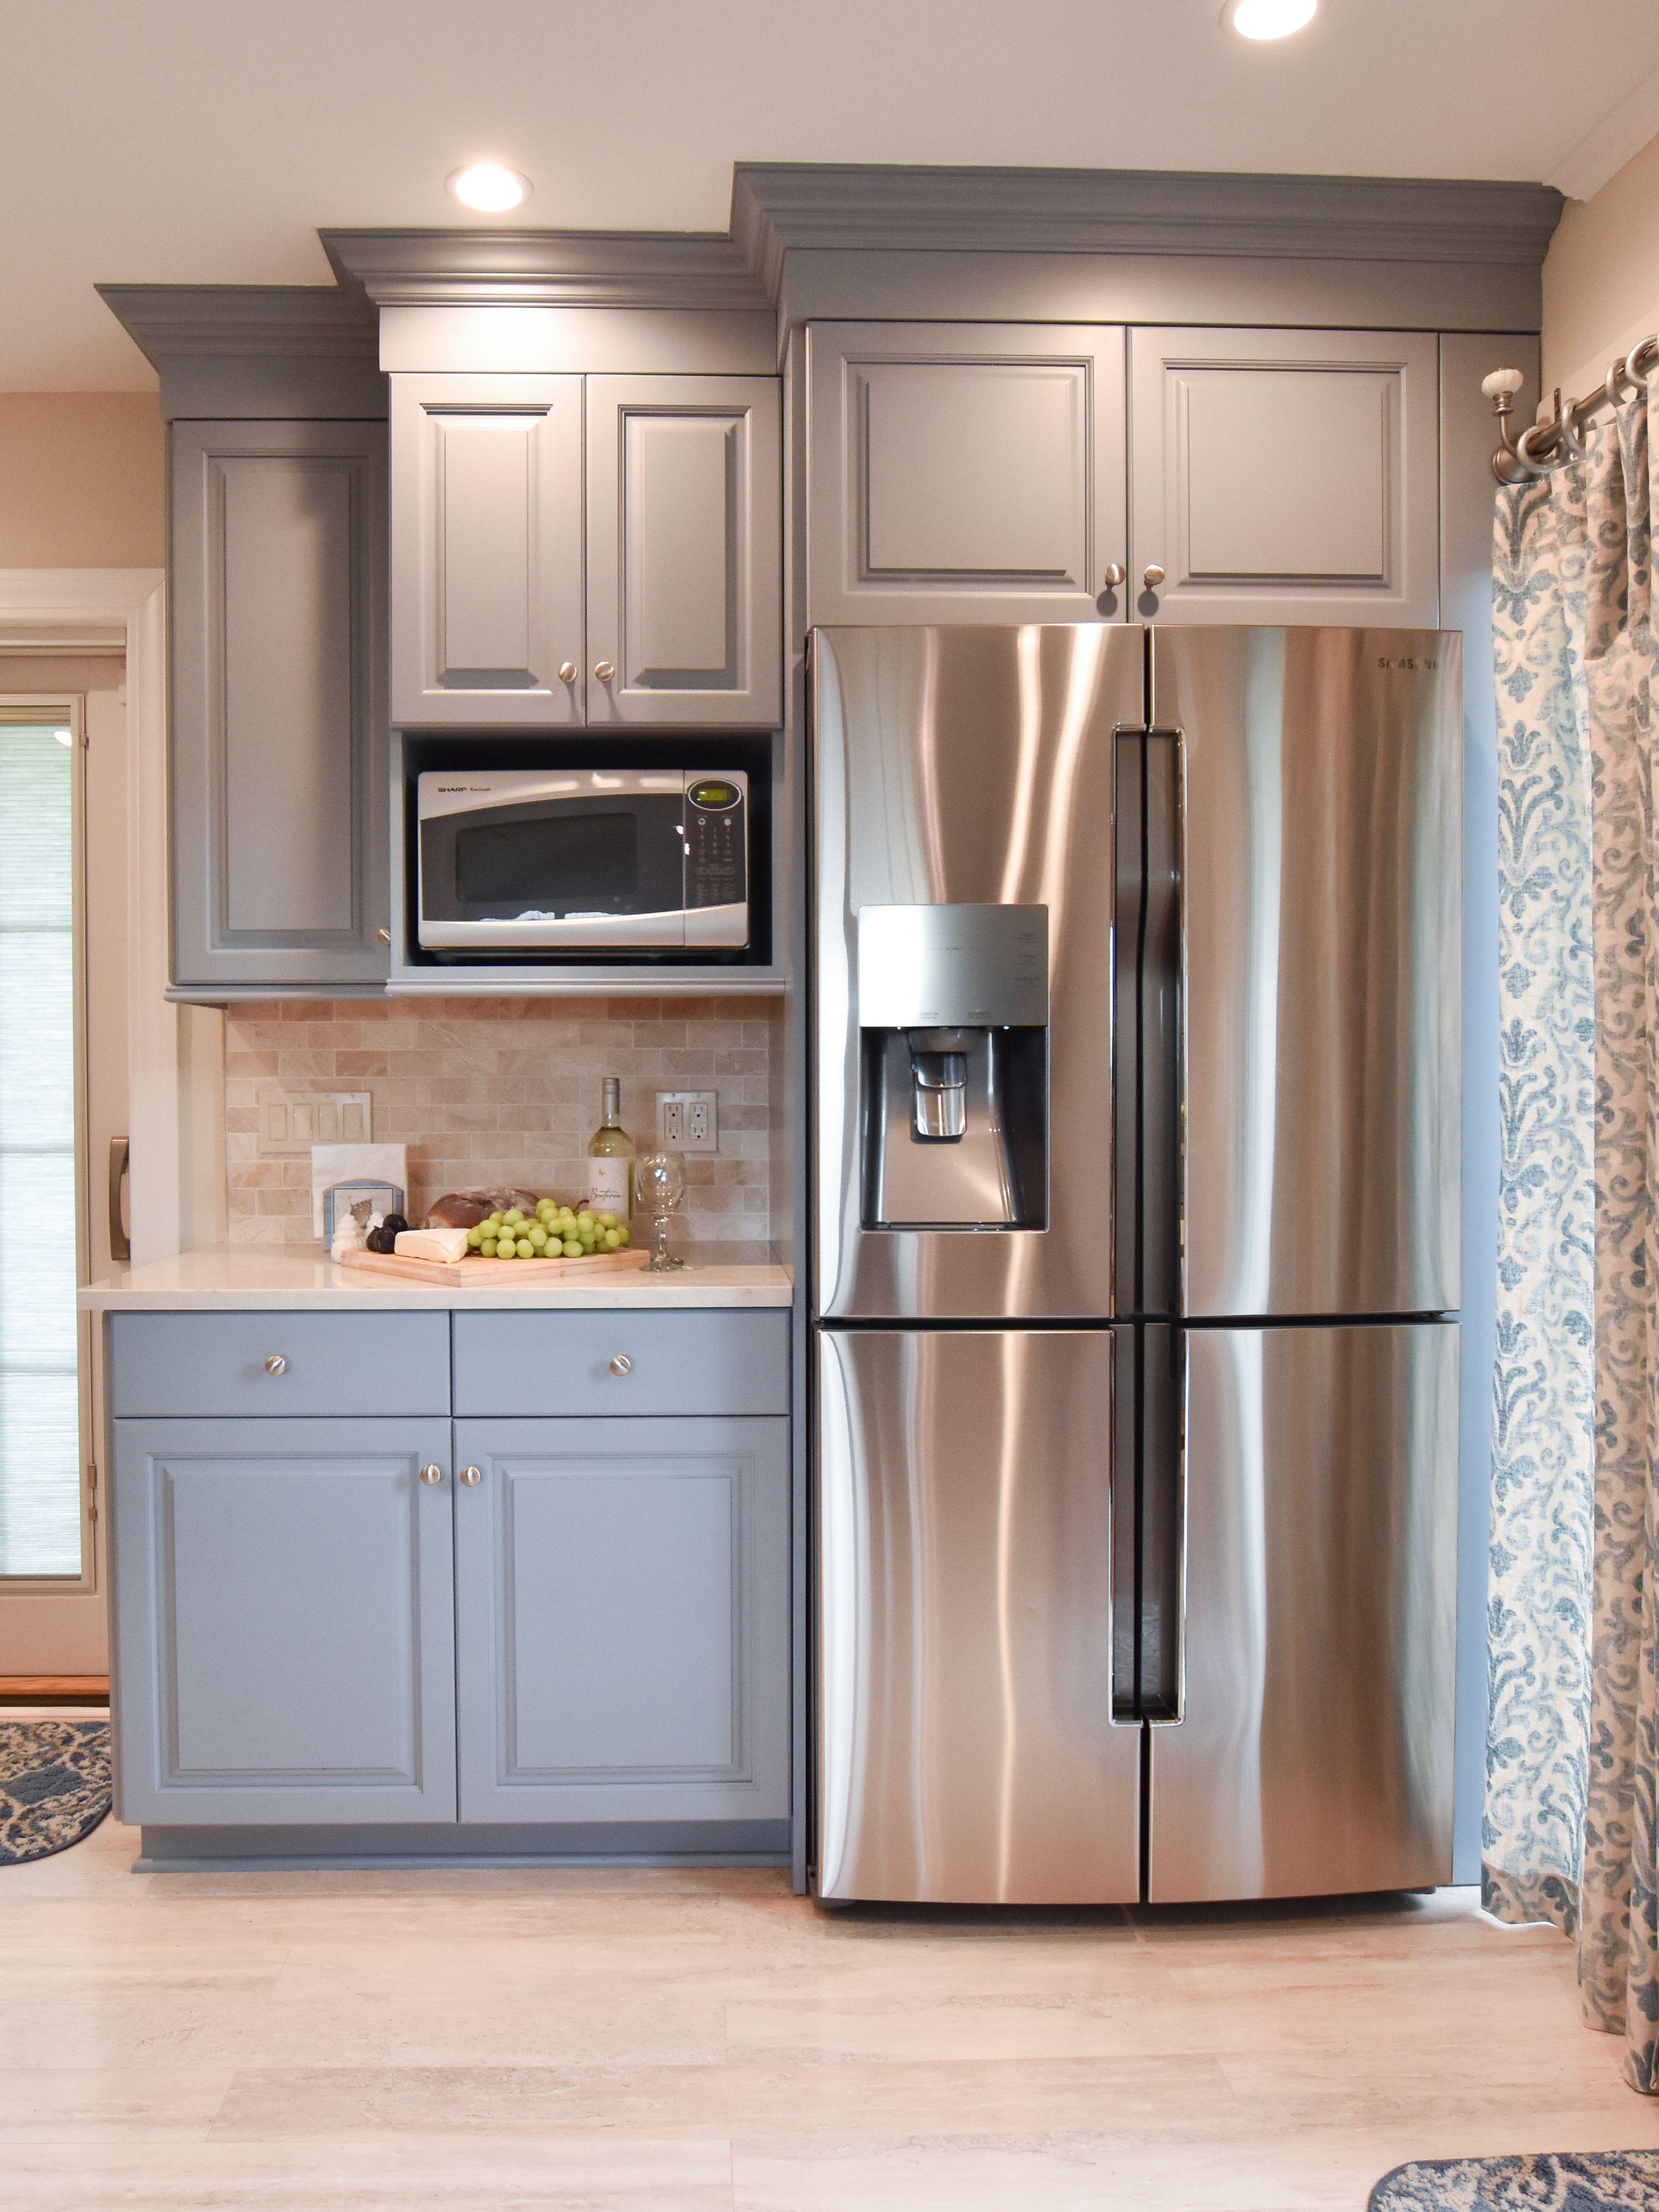 Photos   Kitchen Depot   Kitchen remodel small, Kitchen, Kitchen ...